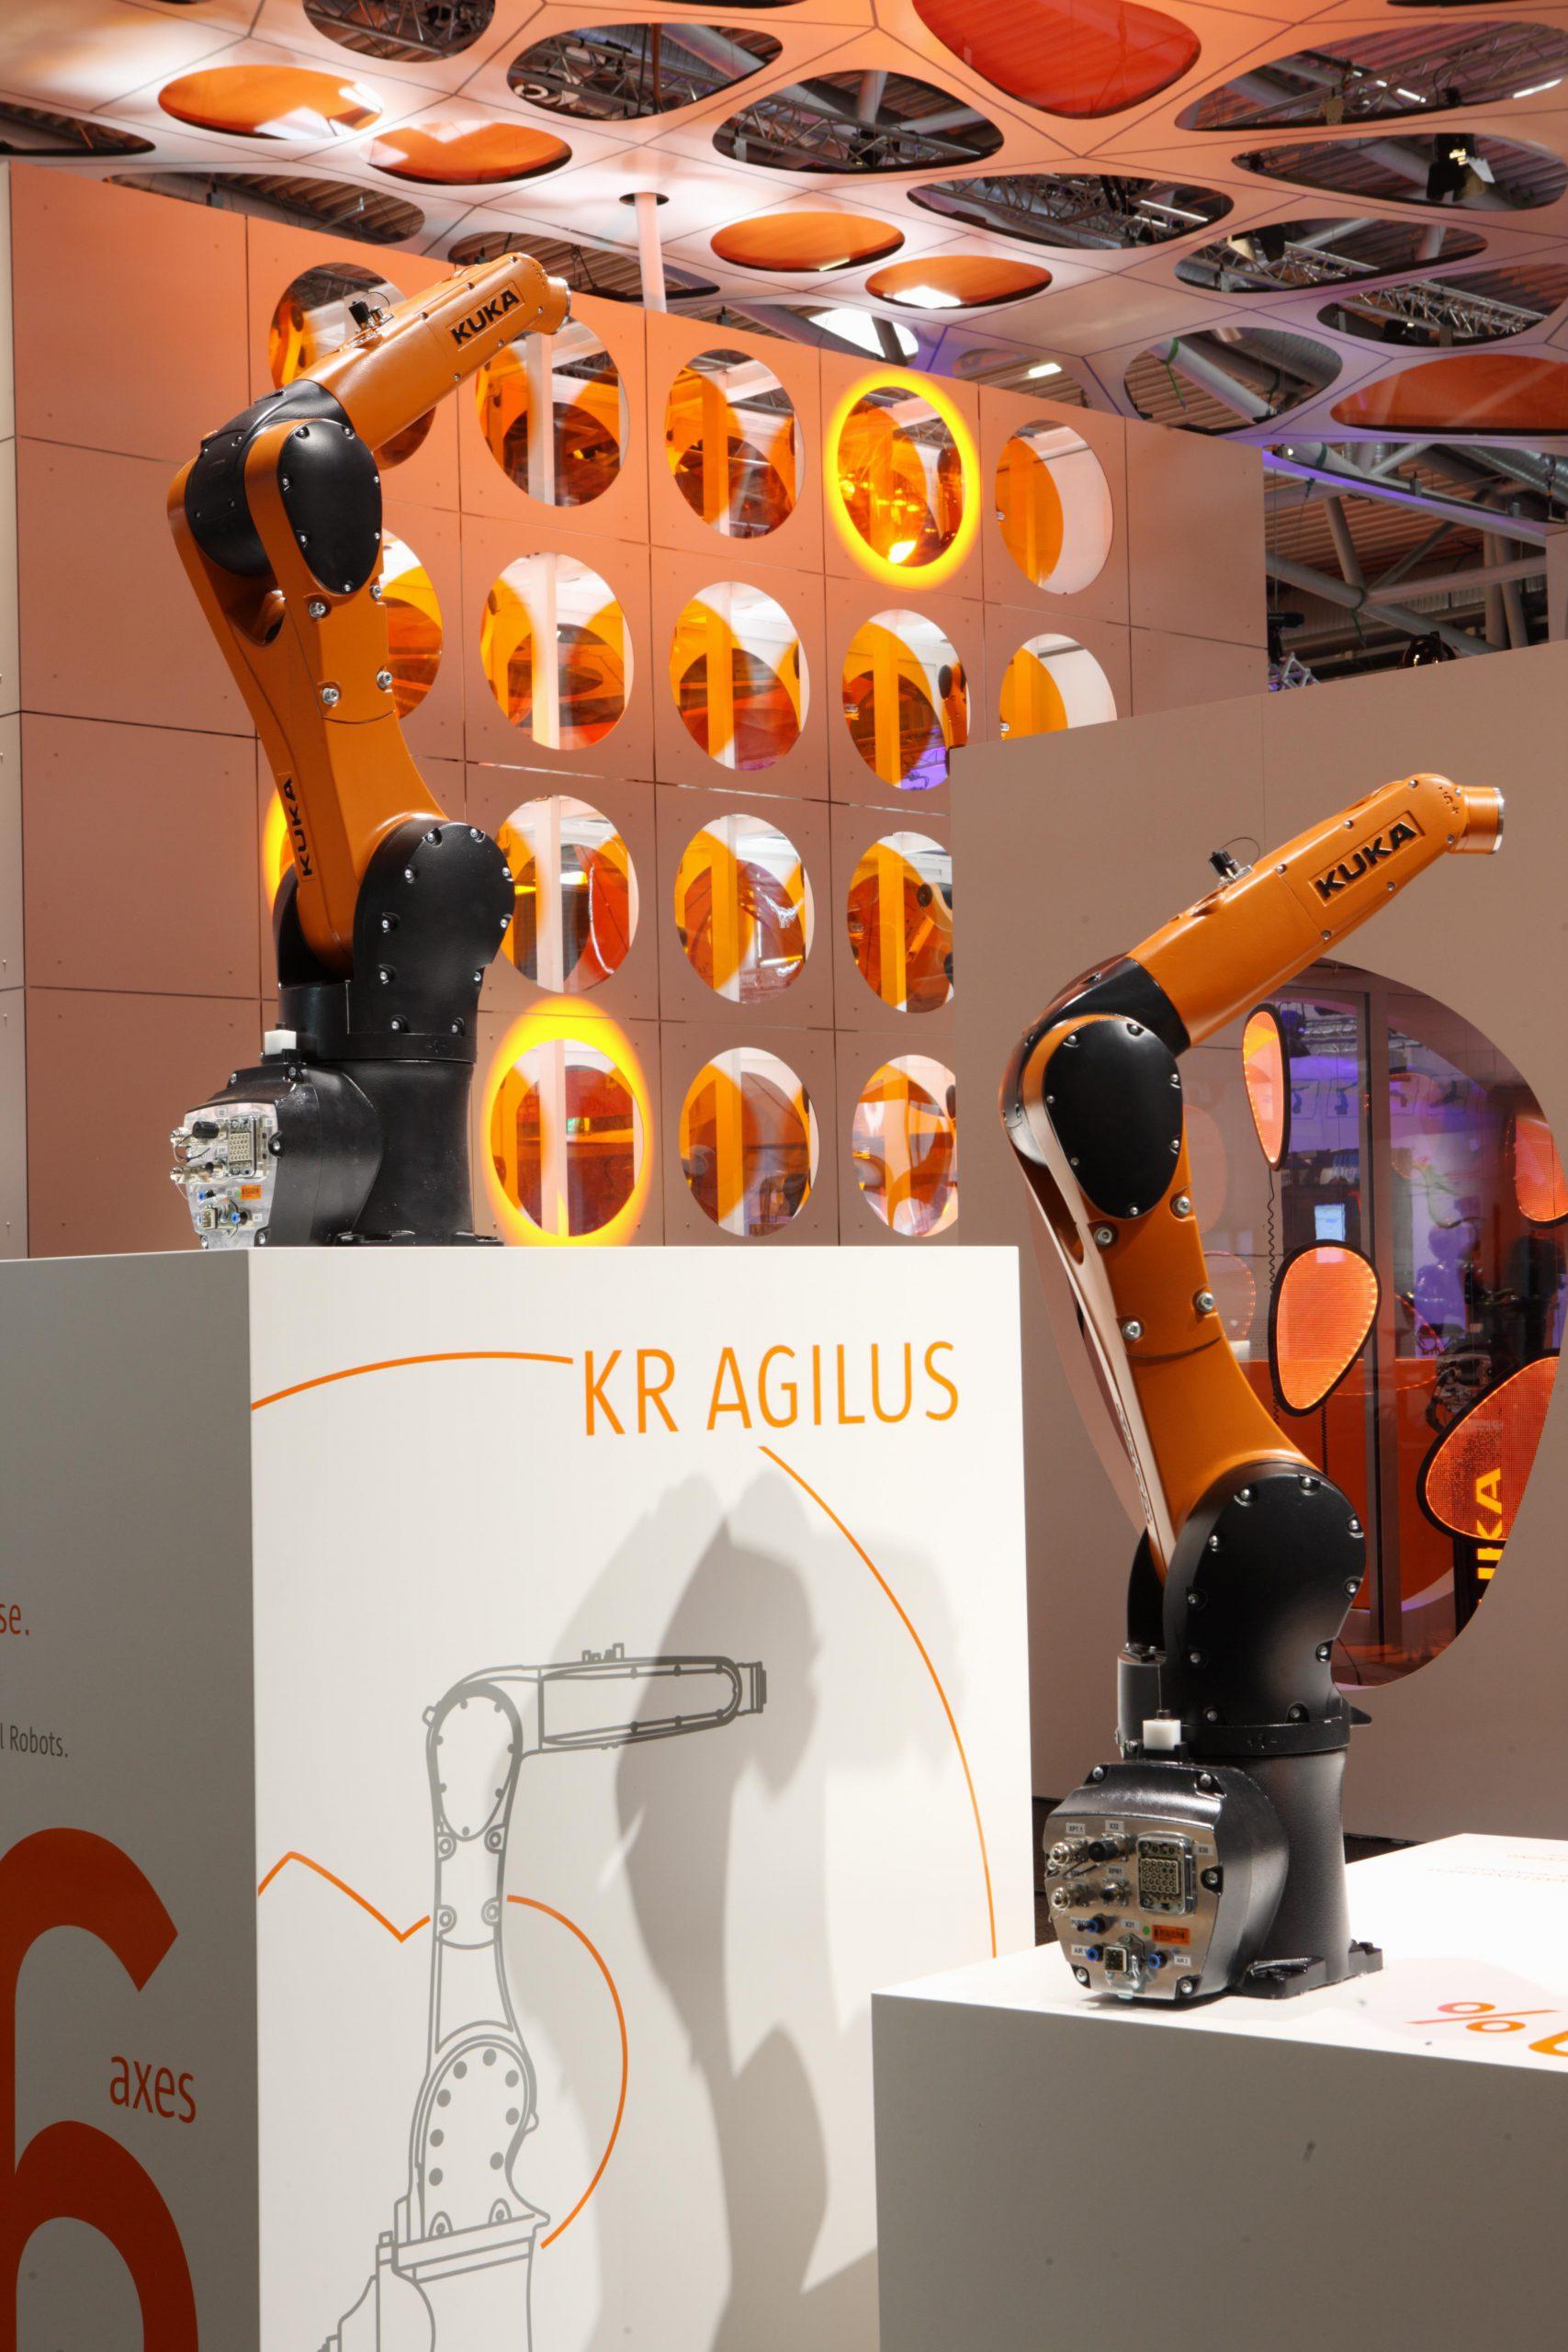 KUKA KR 10 R900 sixx (KR AGILUS)-5